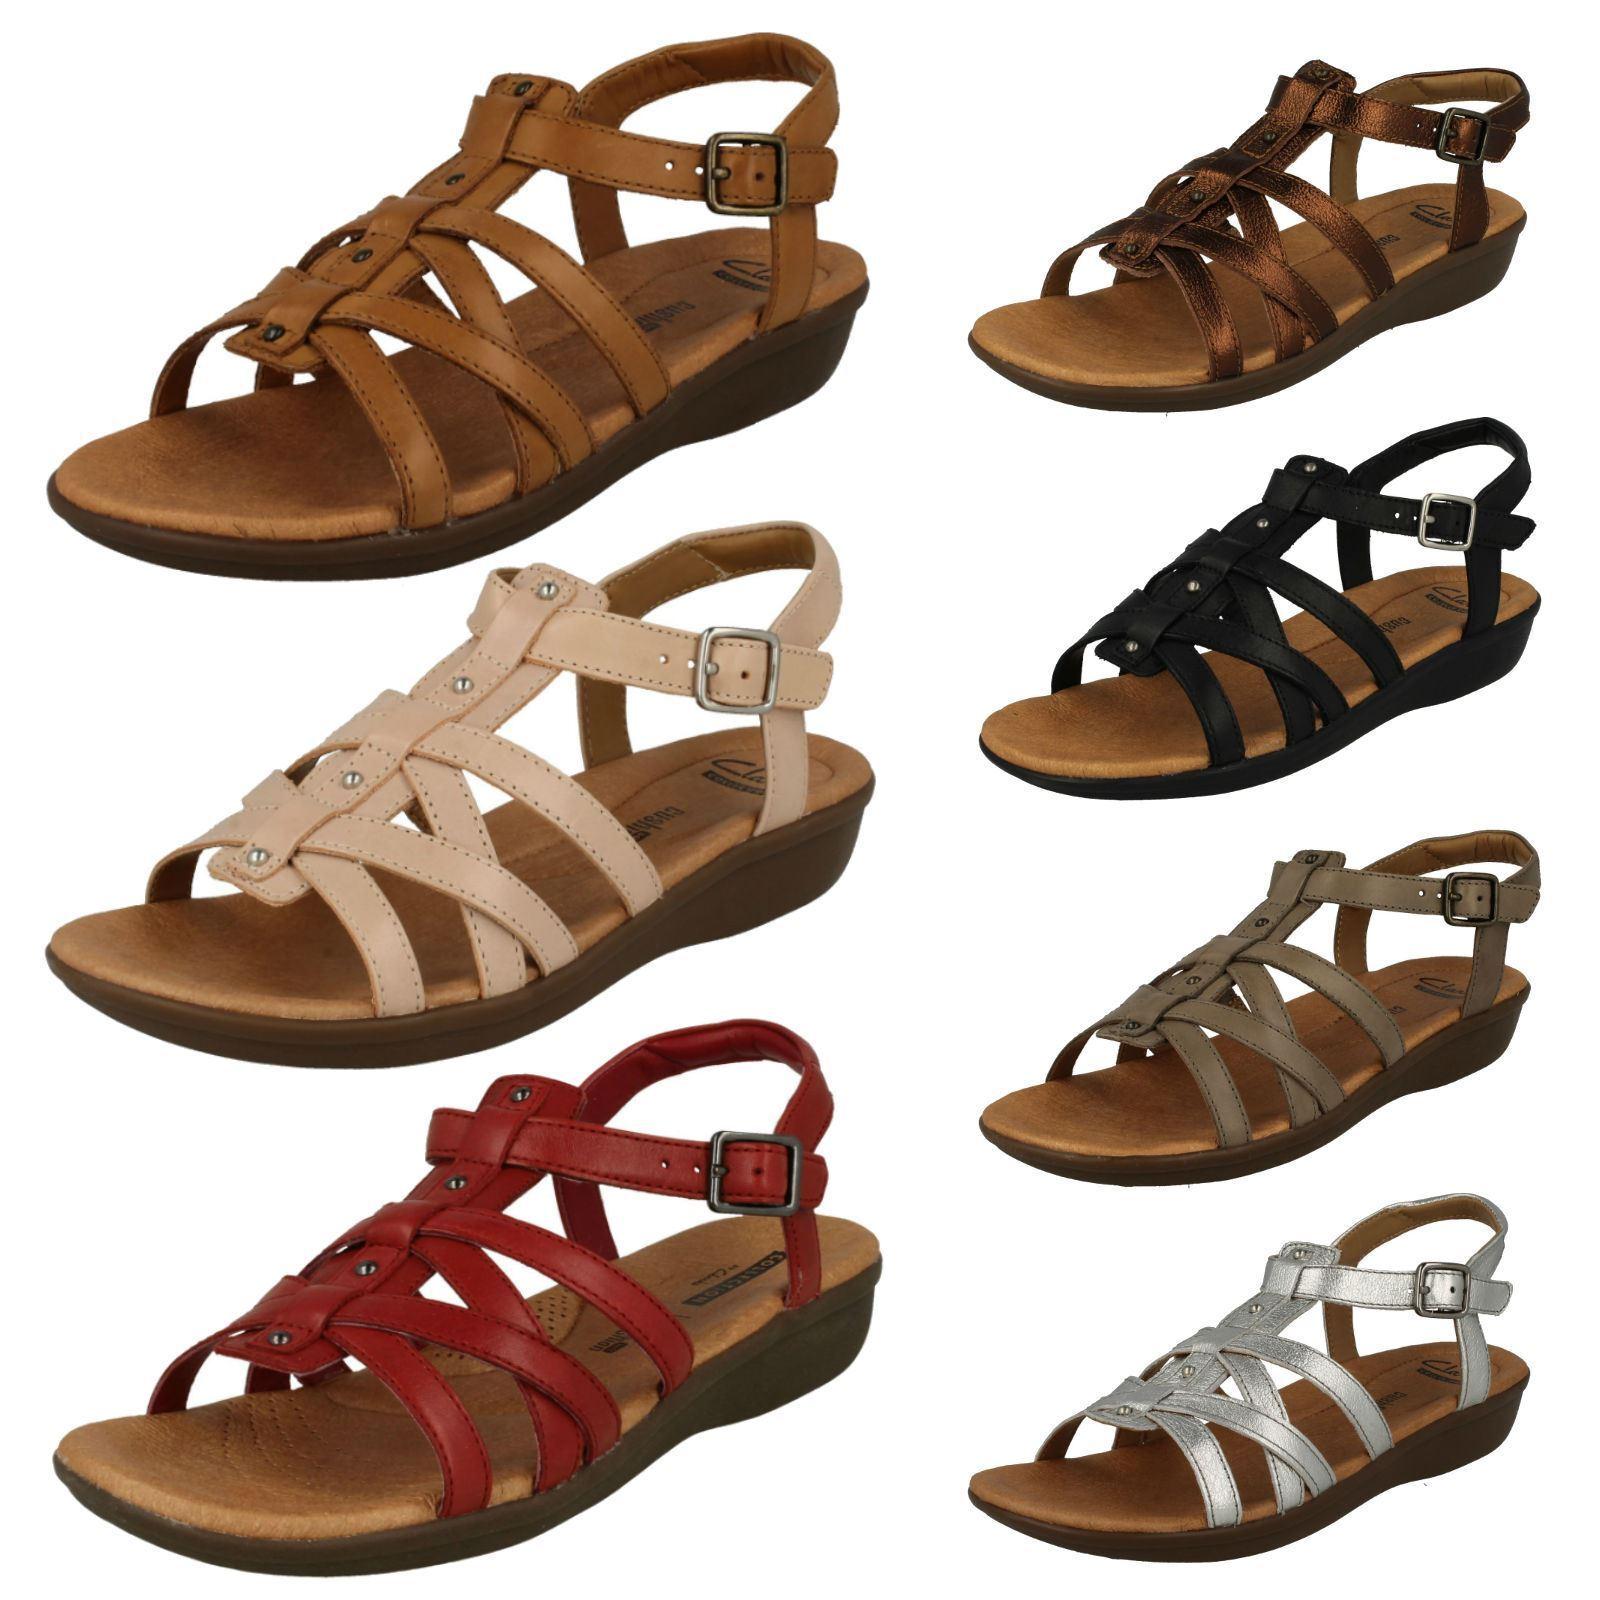 Womens Clarks Gladiator Style Sandals 'Manilla Bonita'